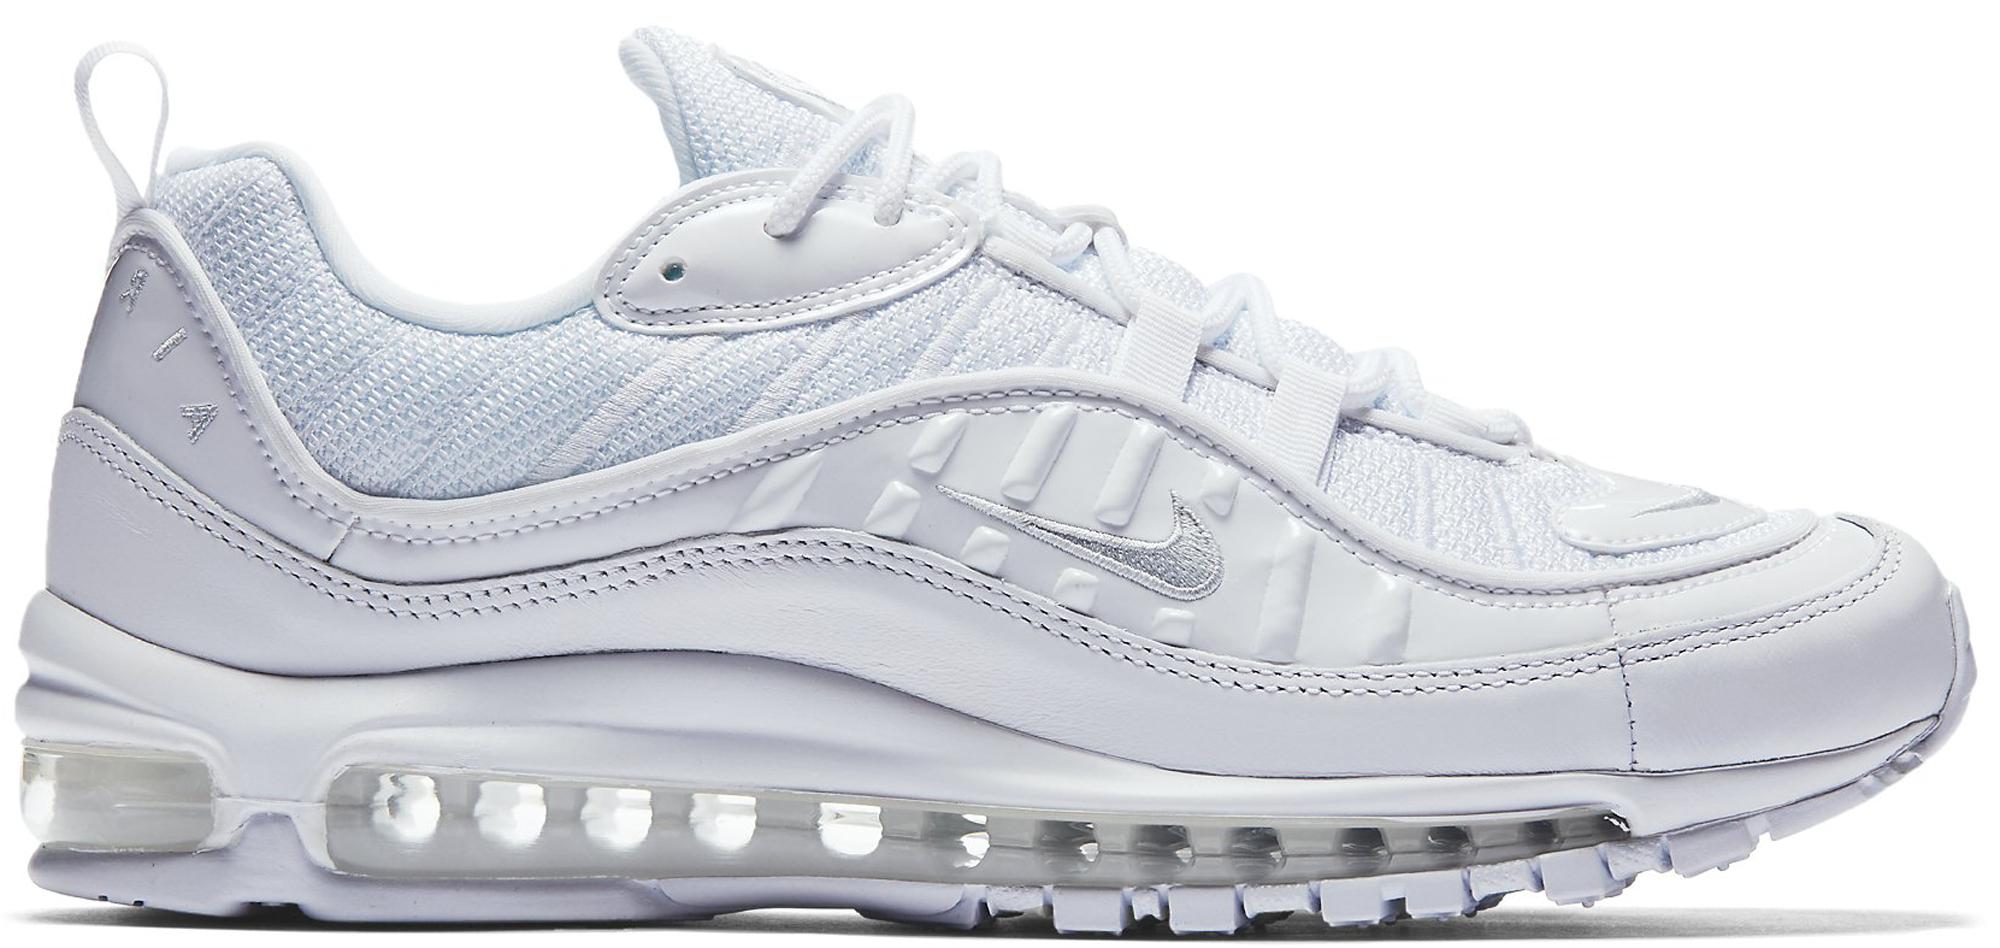 sports shoes 62c54 cff6c 98 air max plus for sale